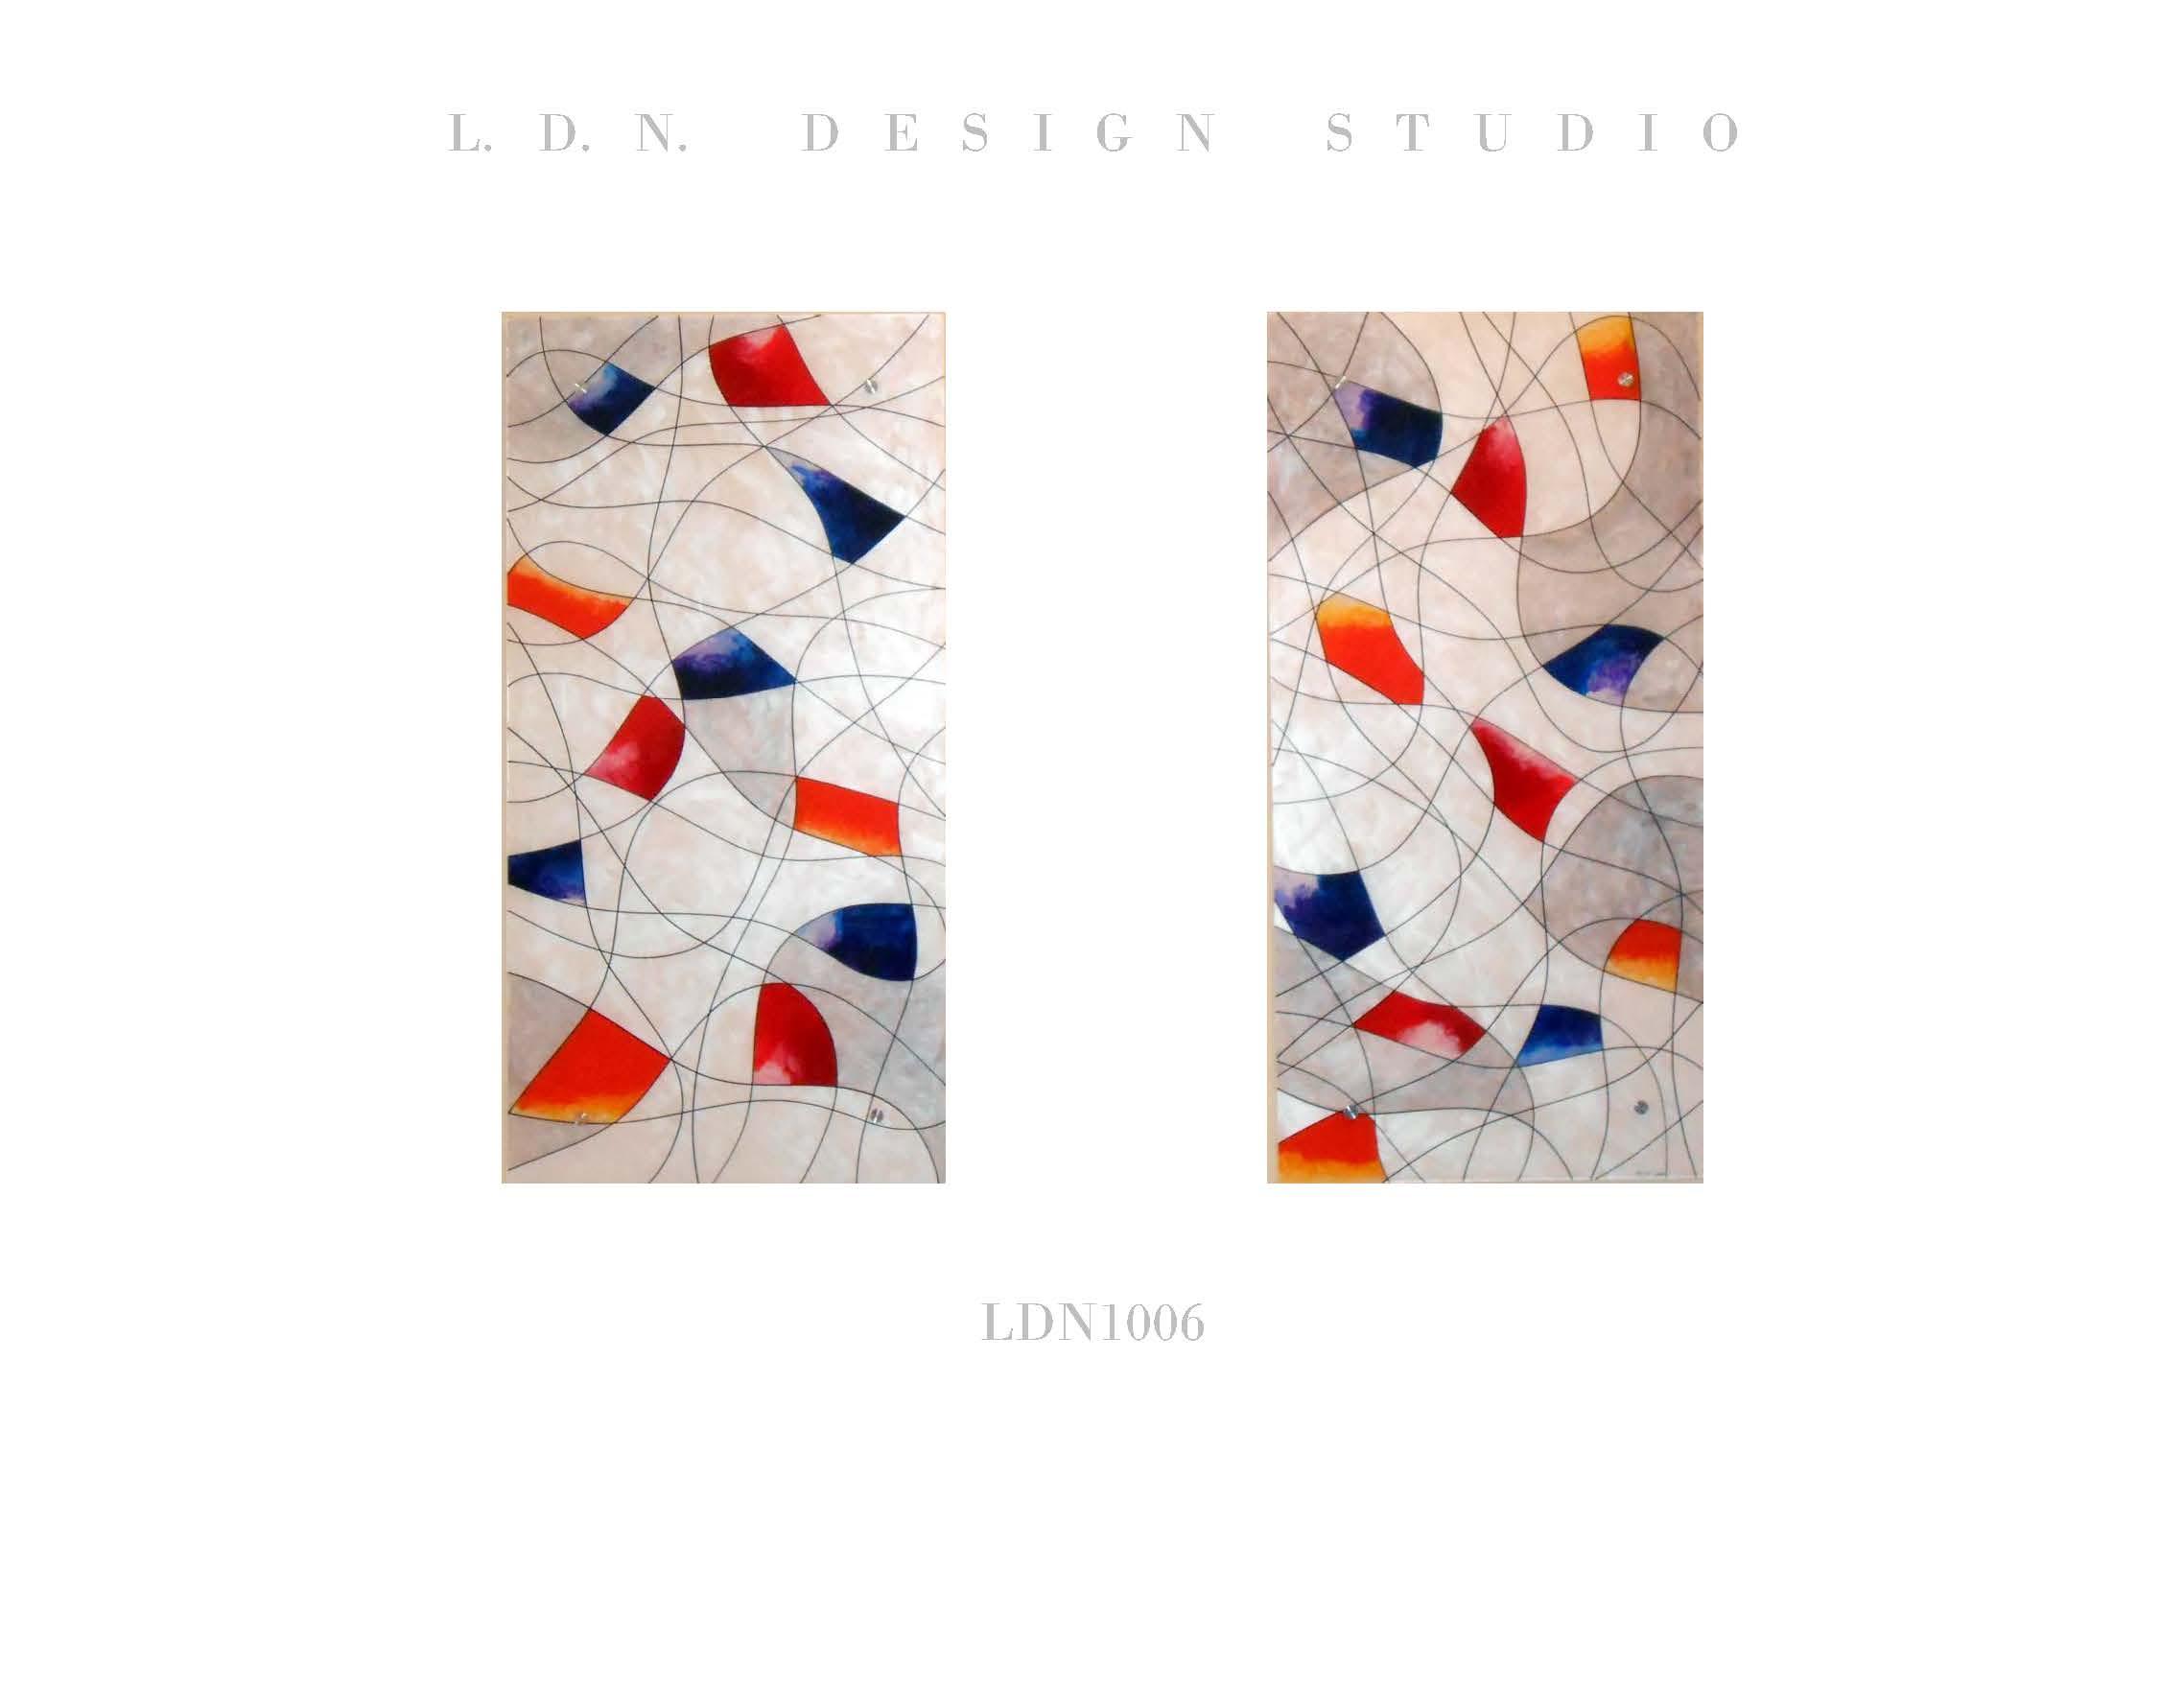 LDN1006